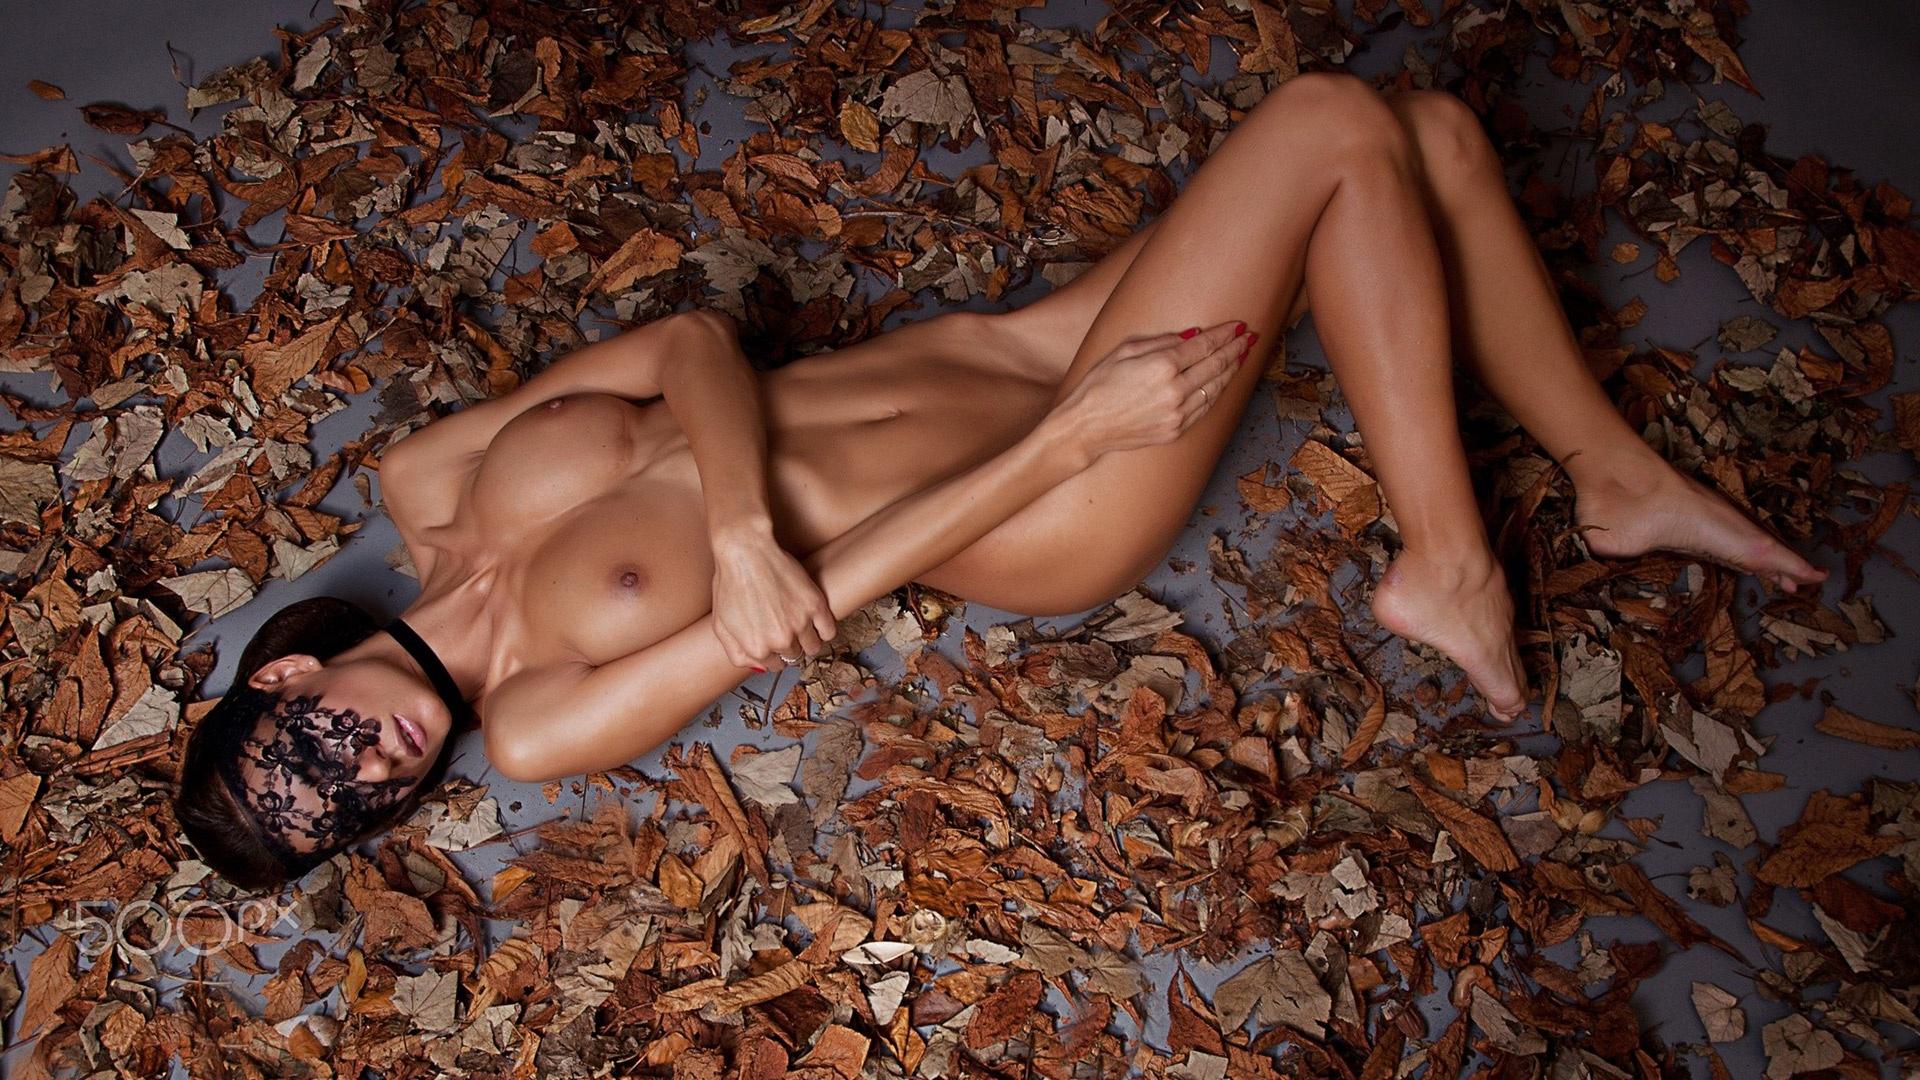 Angel Dark nude skinny brunette pornstar on the floor ...